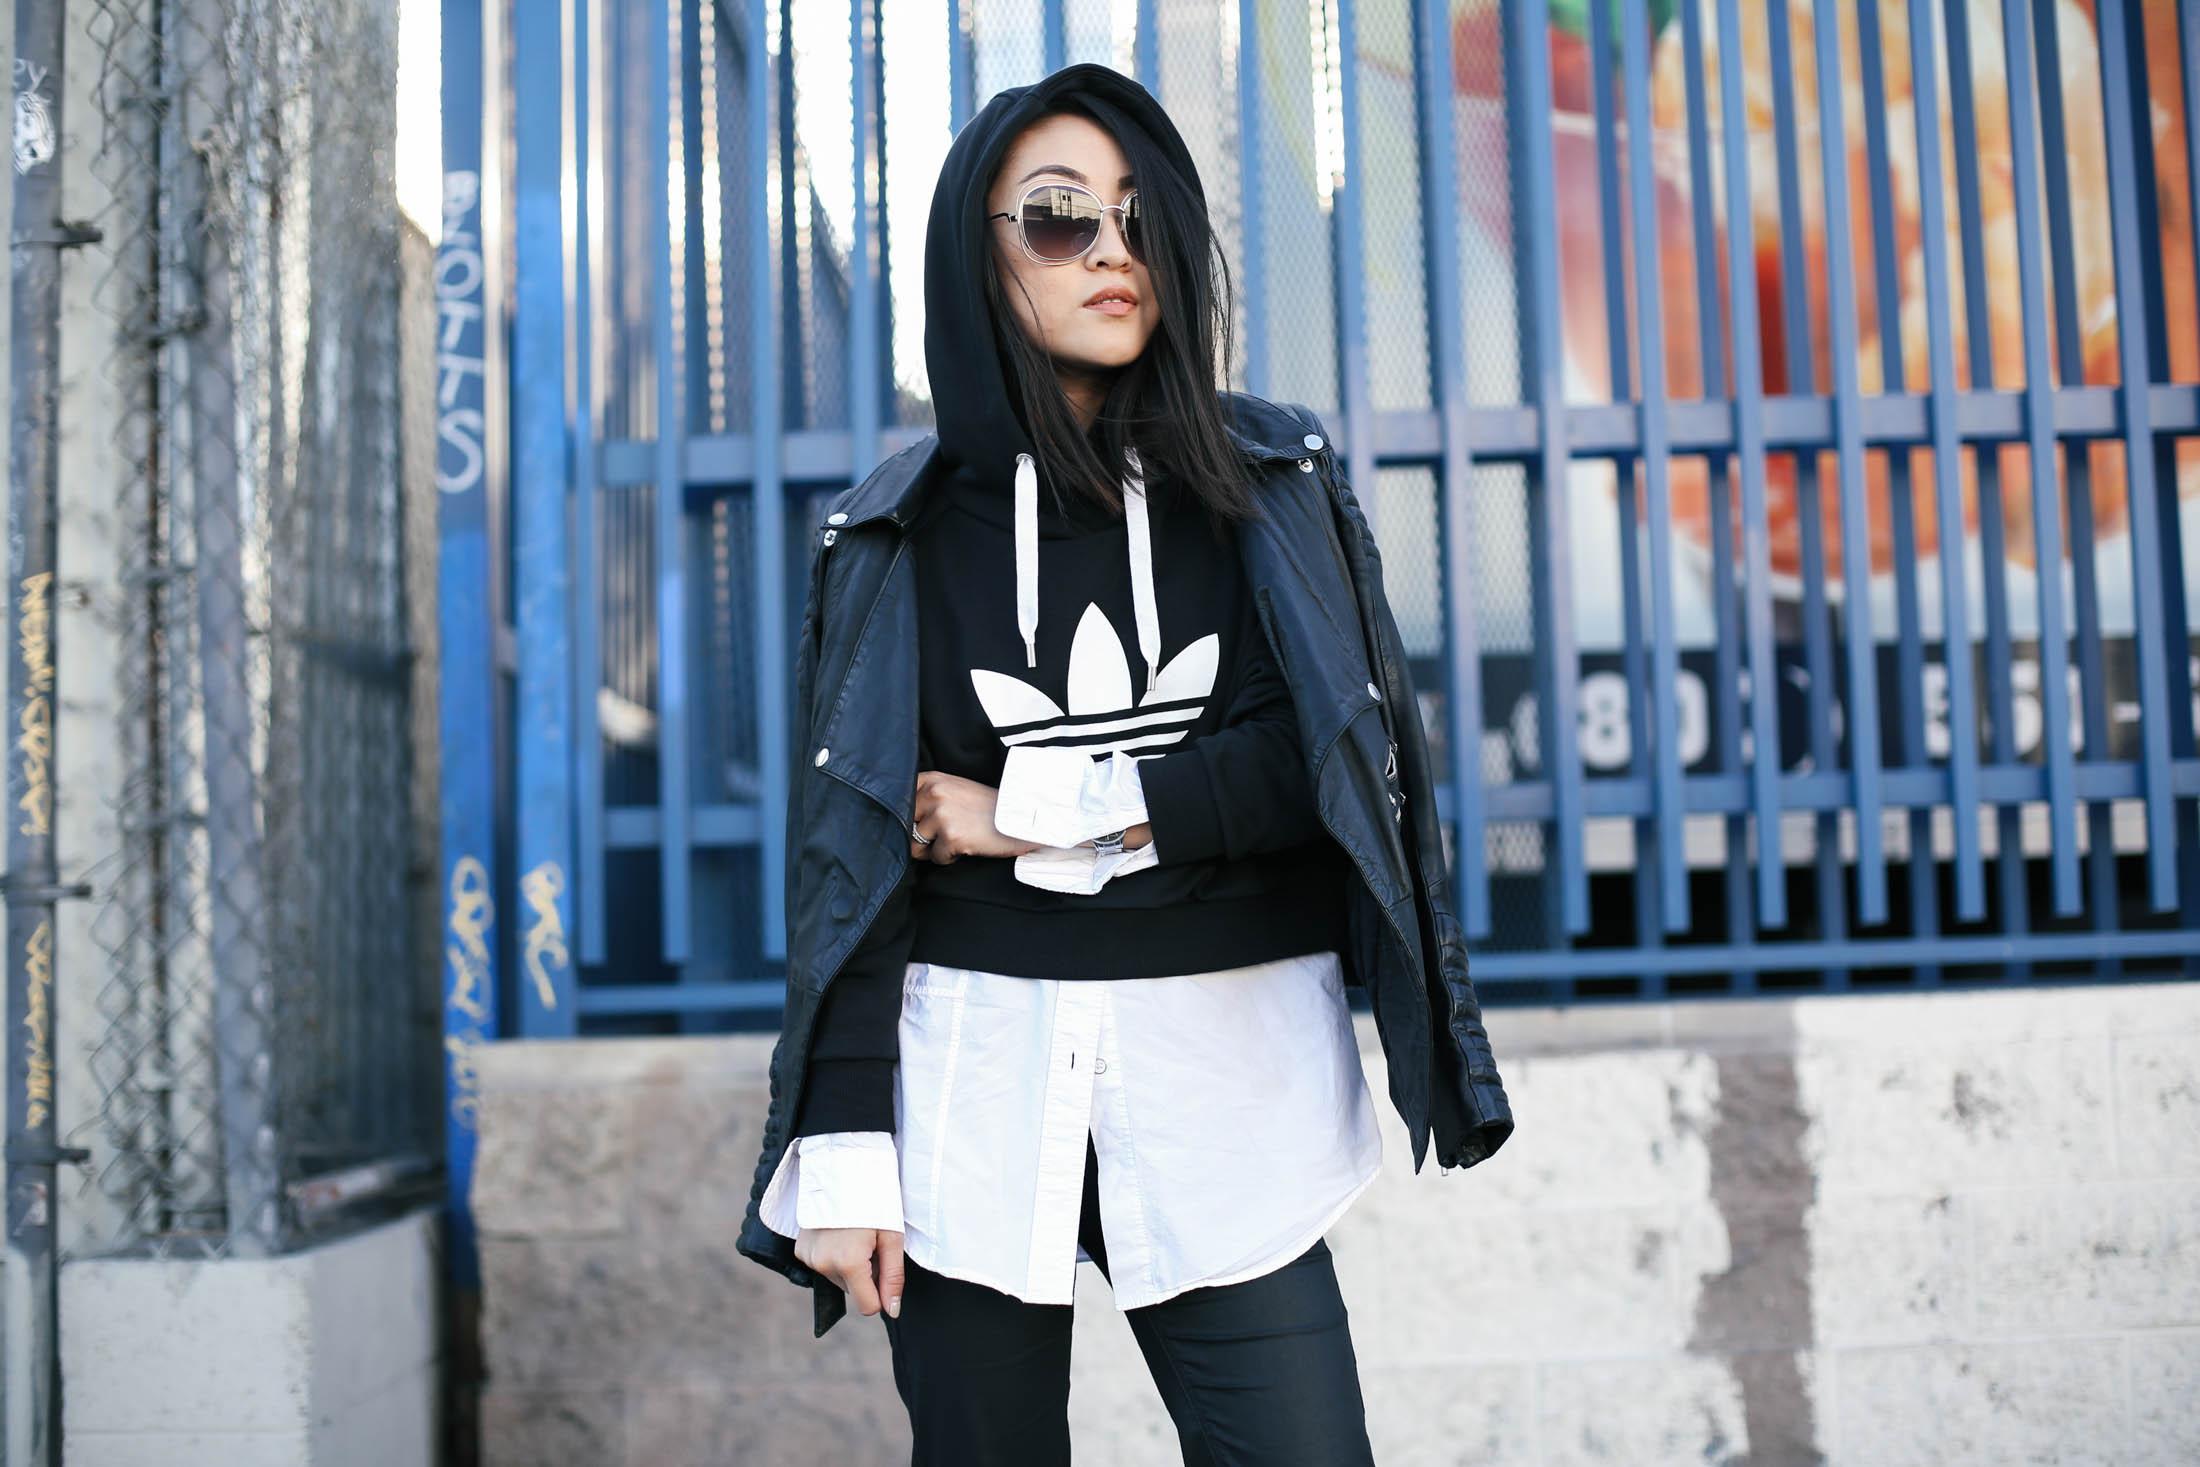 1-adidas-top-nina-citizensrunway-ryanbyryanchua-9019.jpg